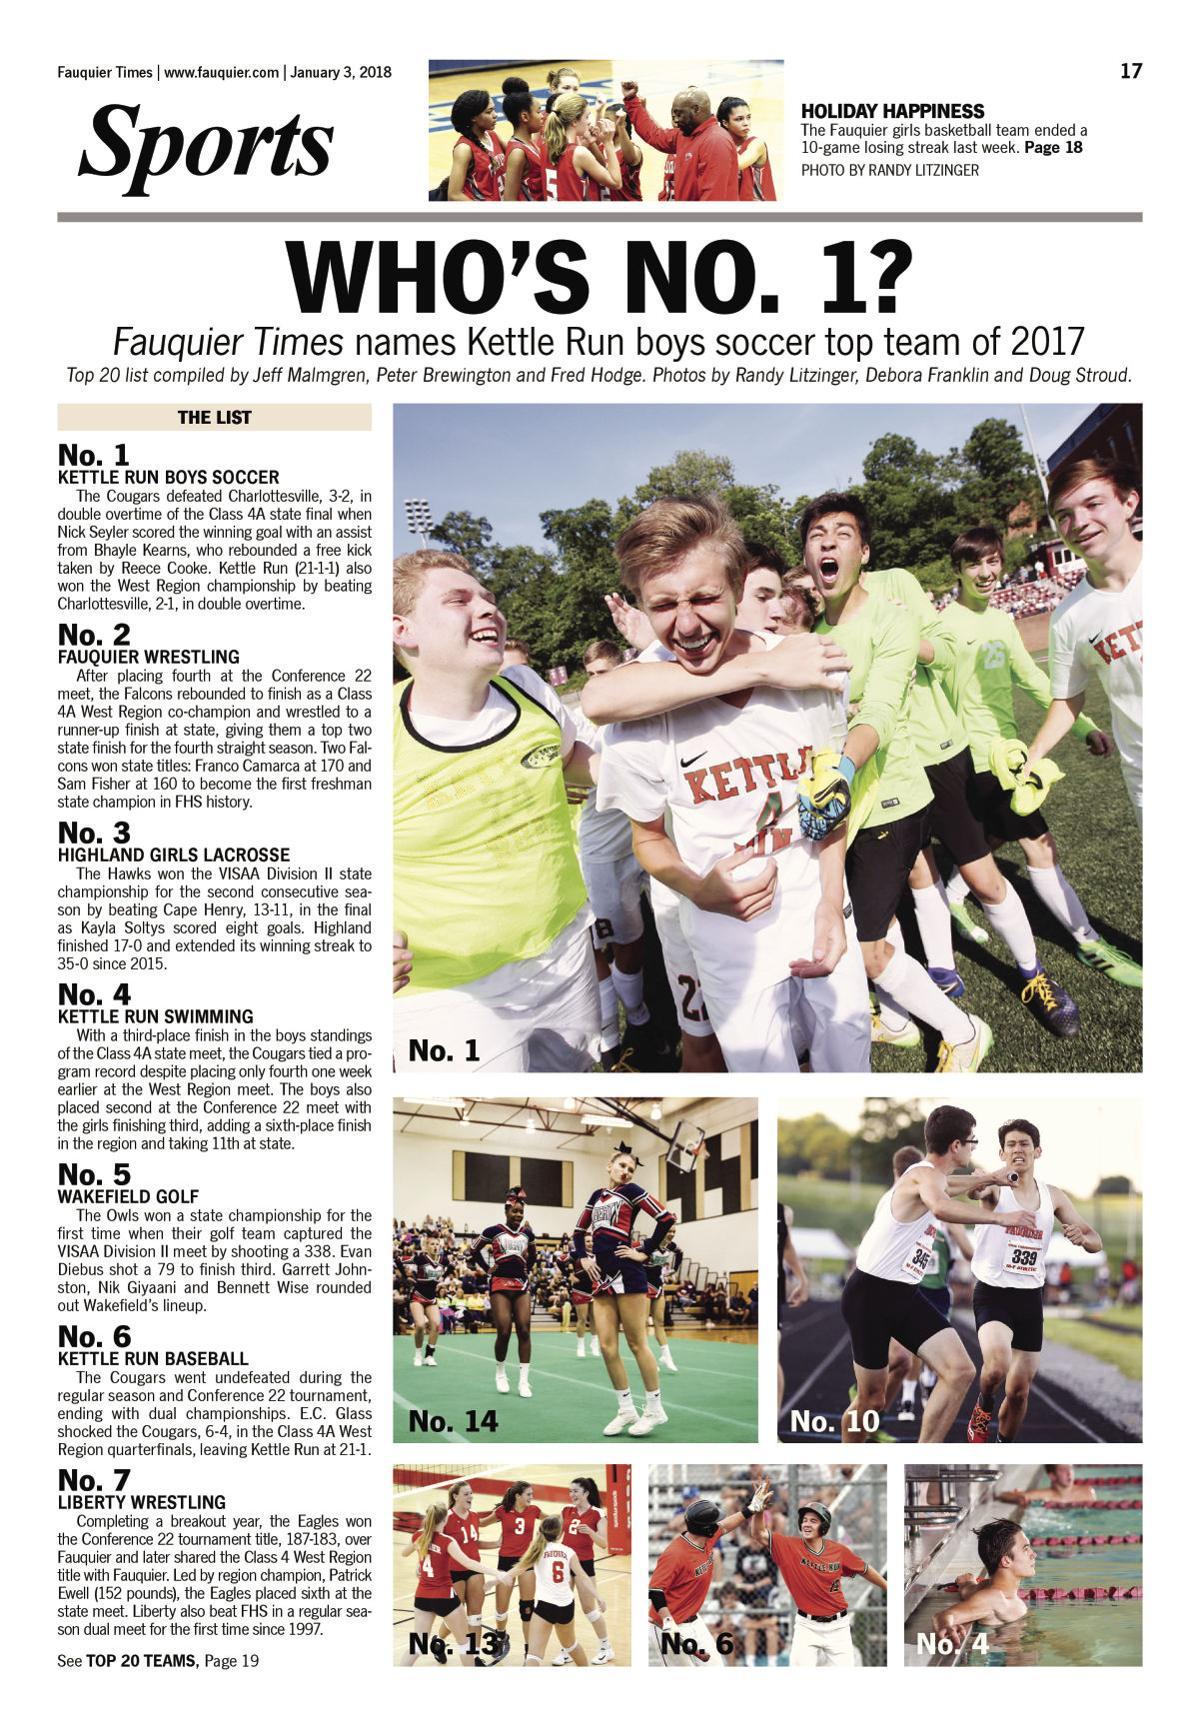 B_Top_10_Sports_Accomplishments